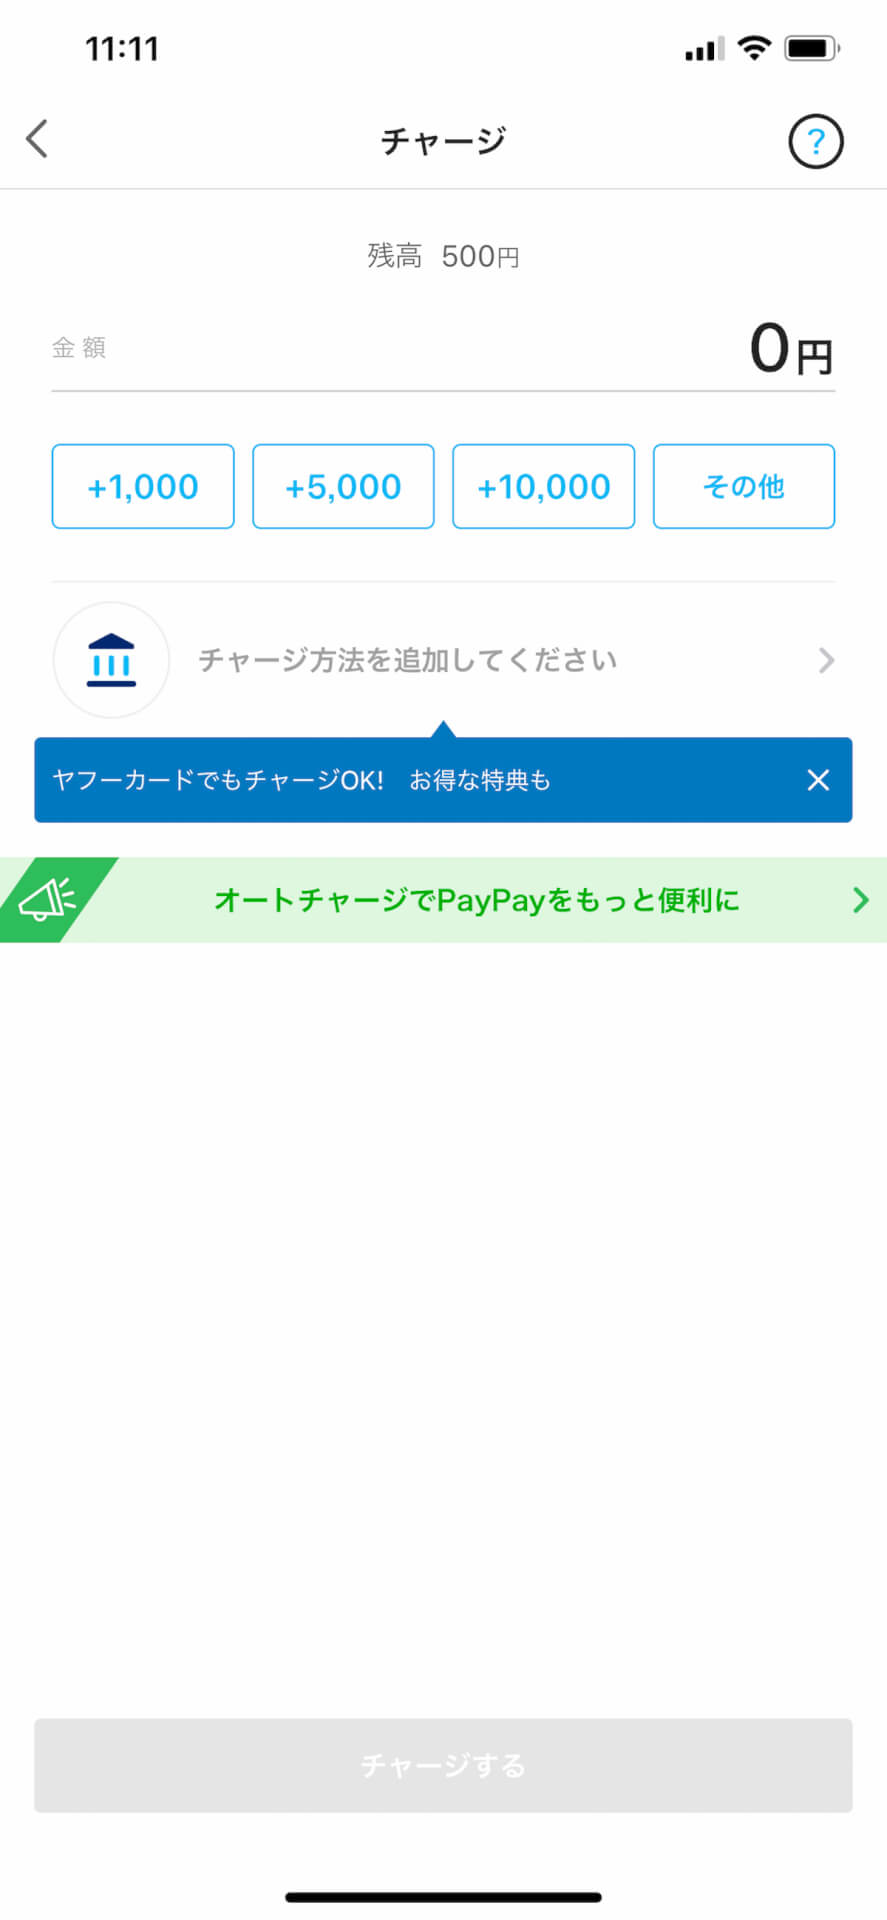 PayPay、iOS版アプリのアップデートでオートチャージ機能が追加|銀行口座、Yahoo!カードからチャージ tech190528_paypay_1